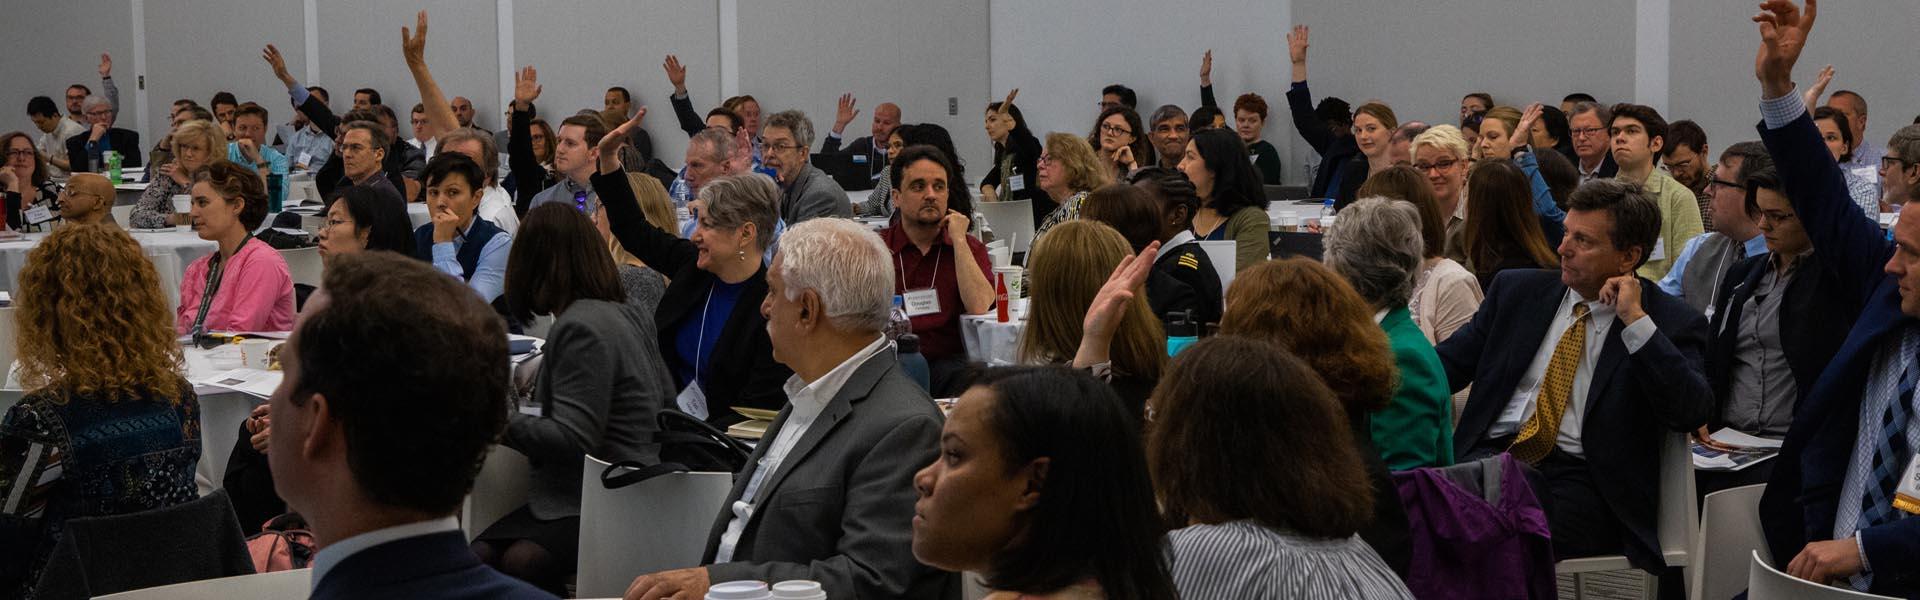 newacs-conference-2019-b